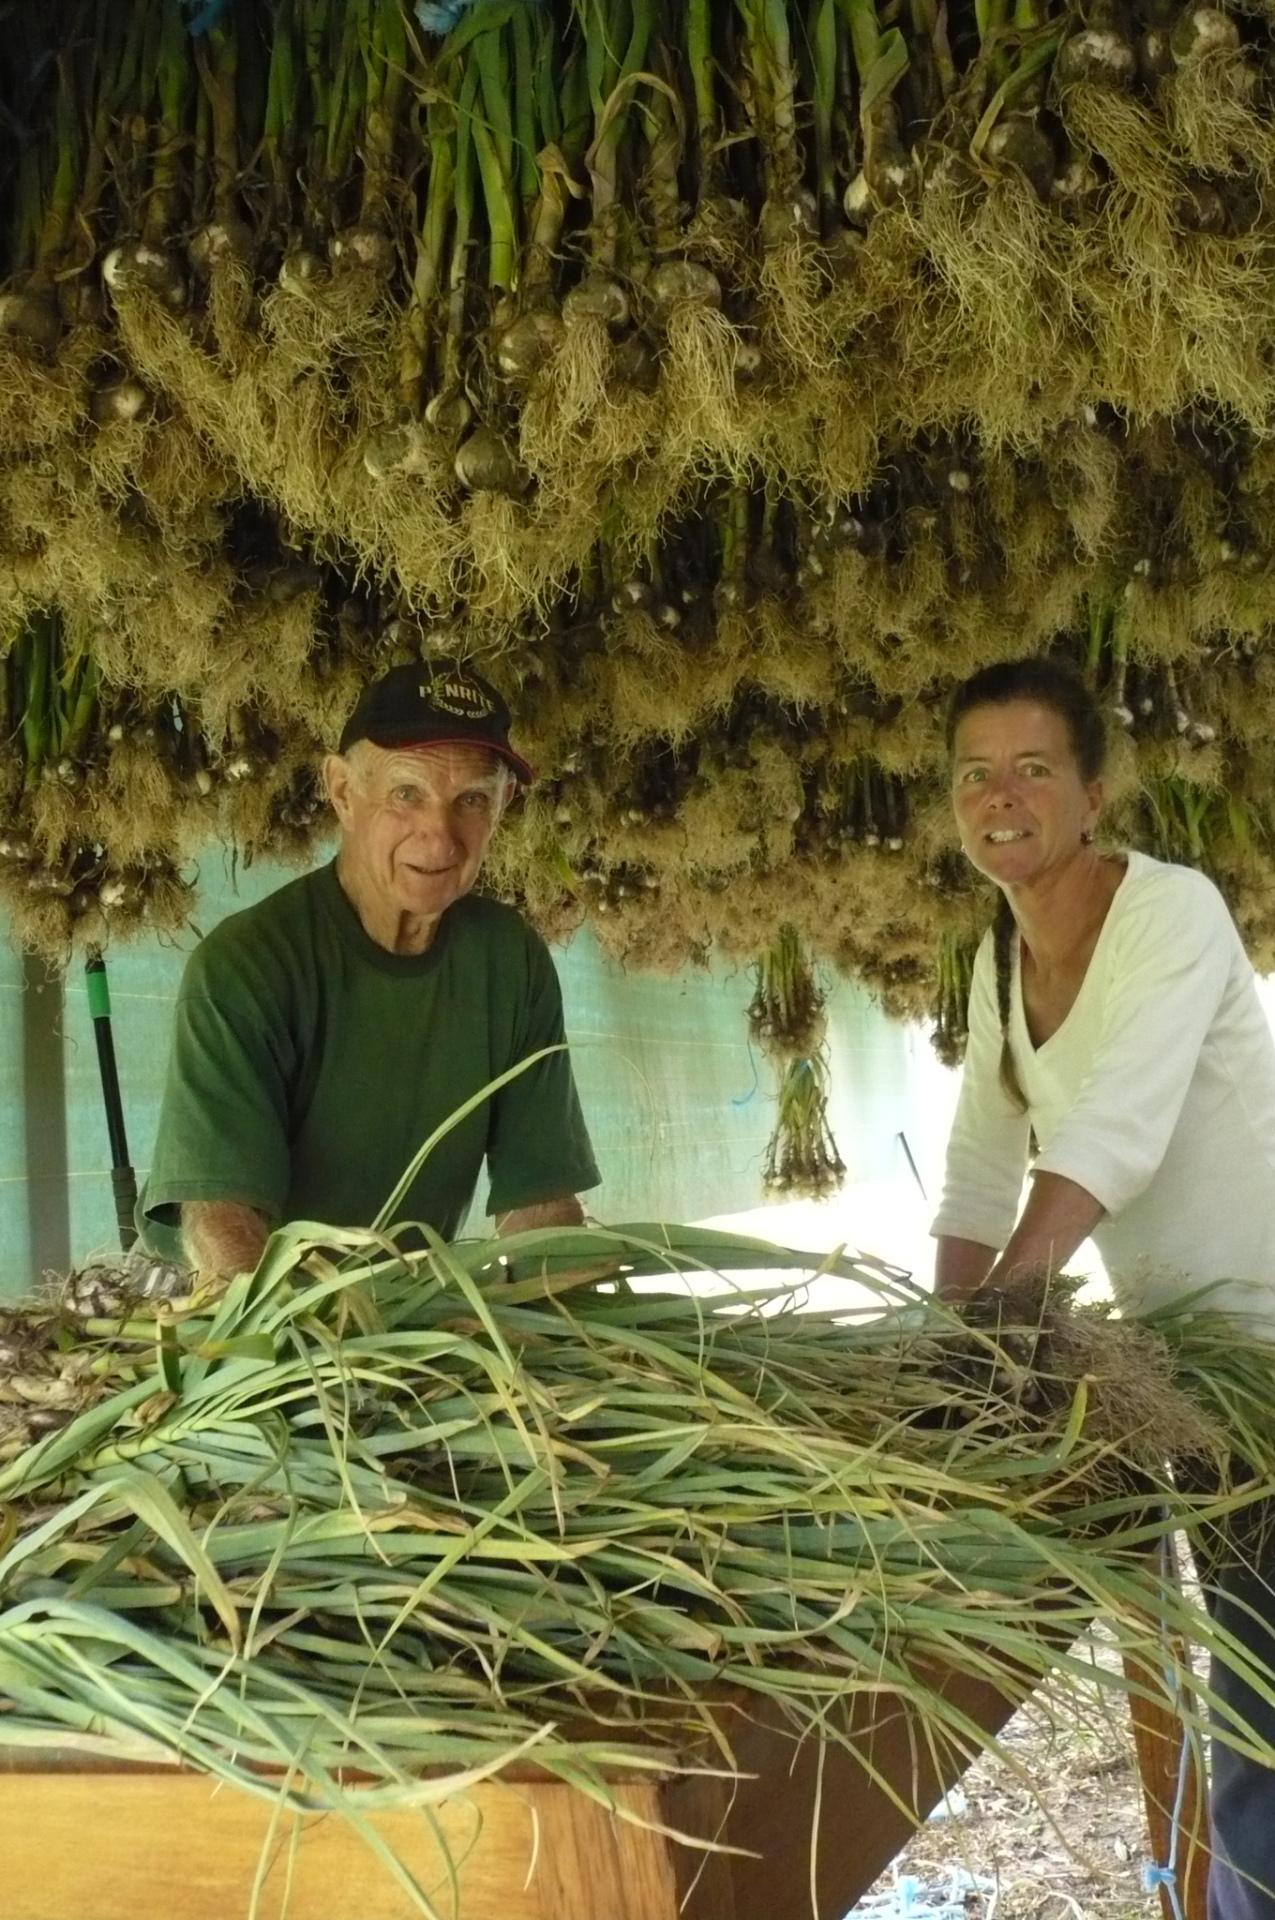 Hung garlic